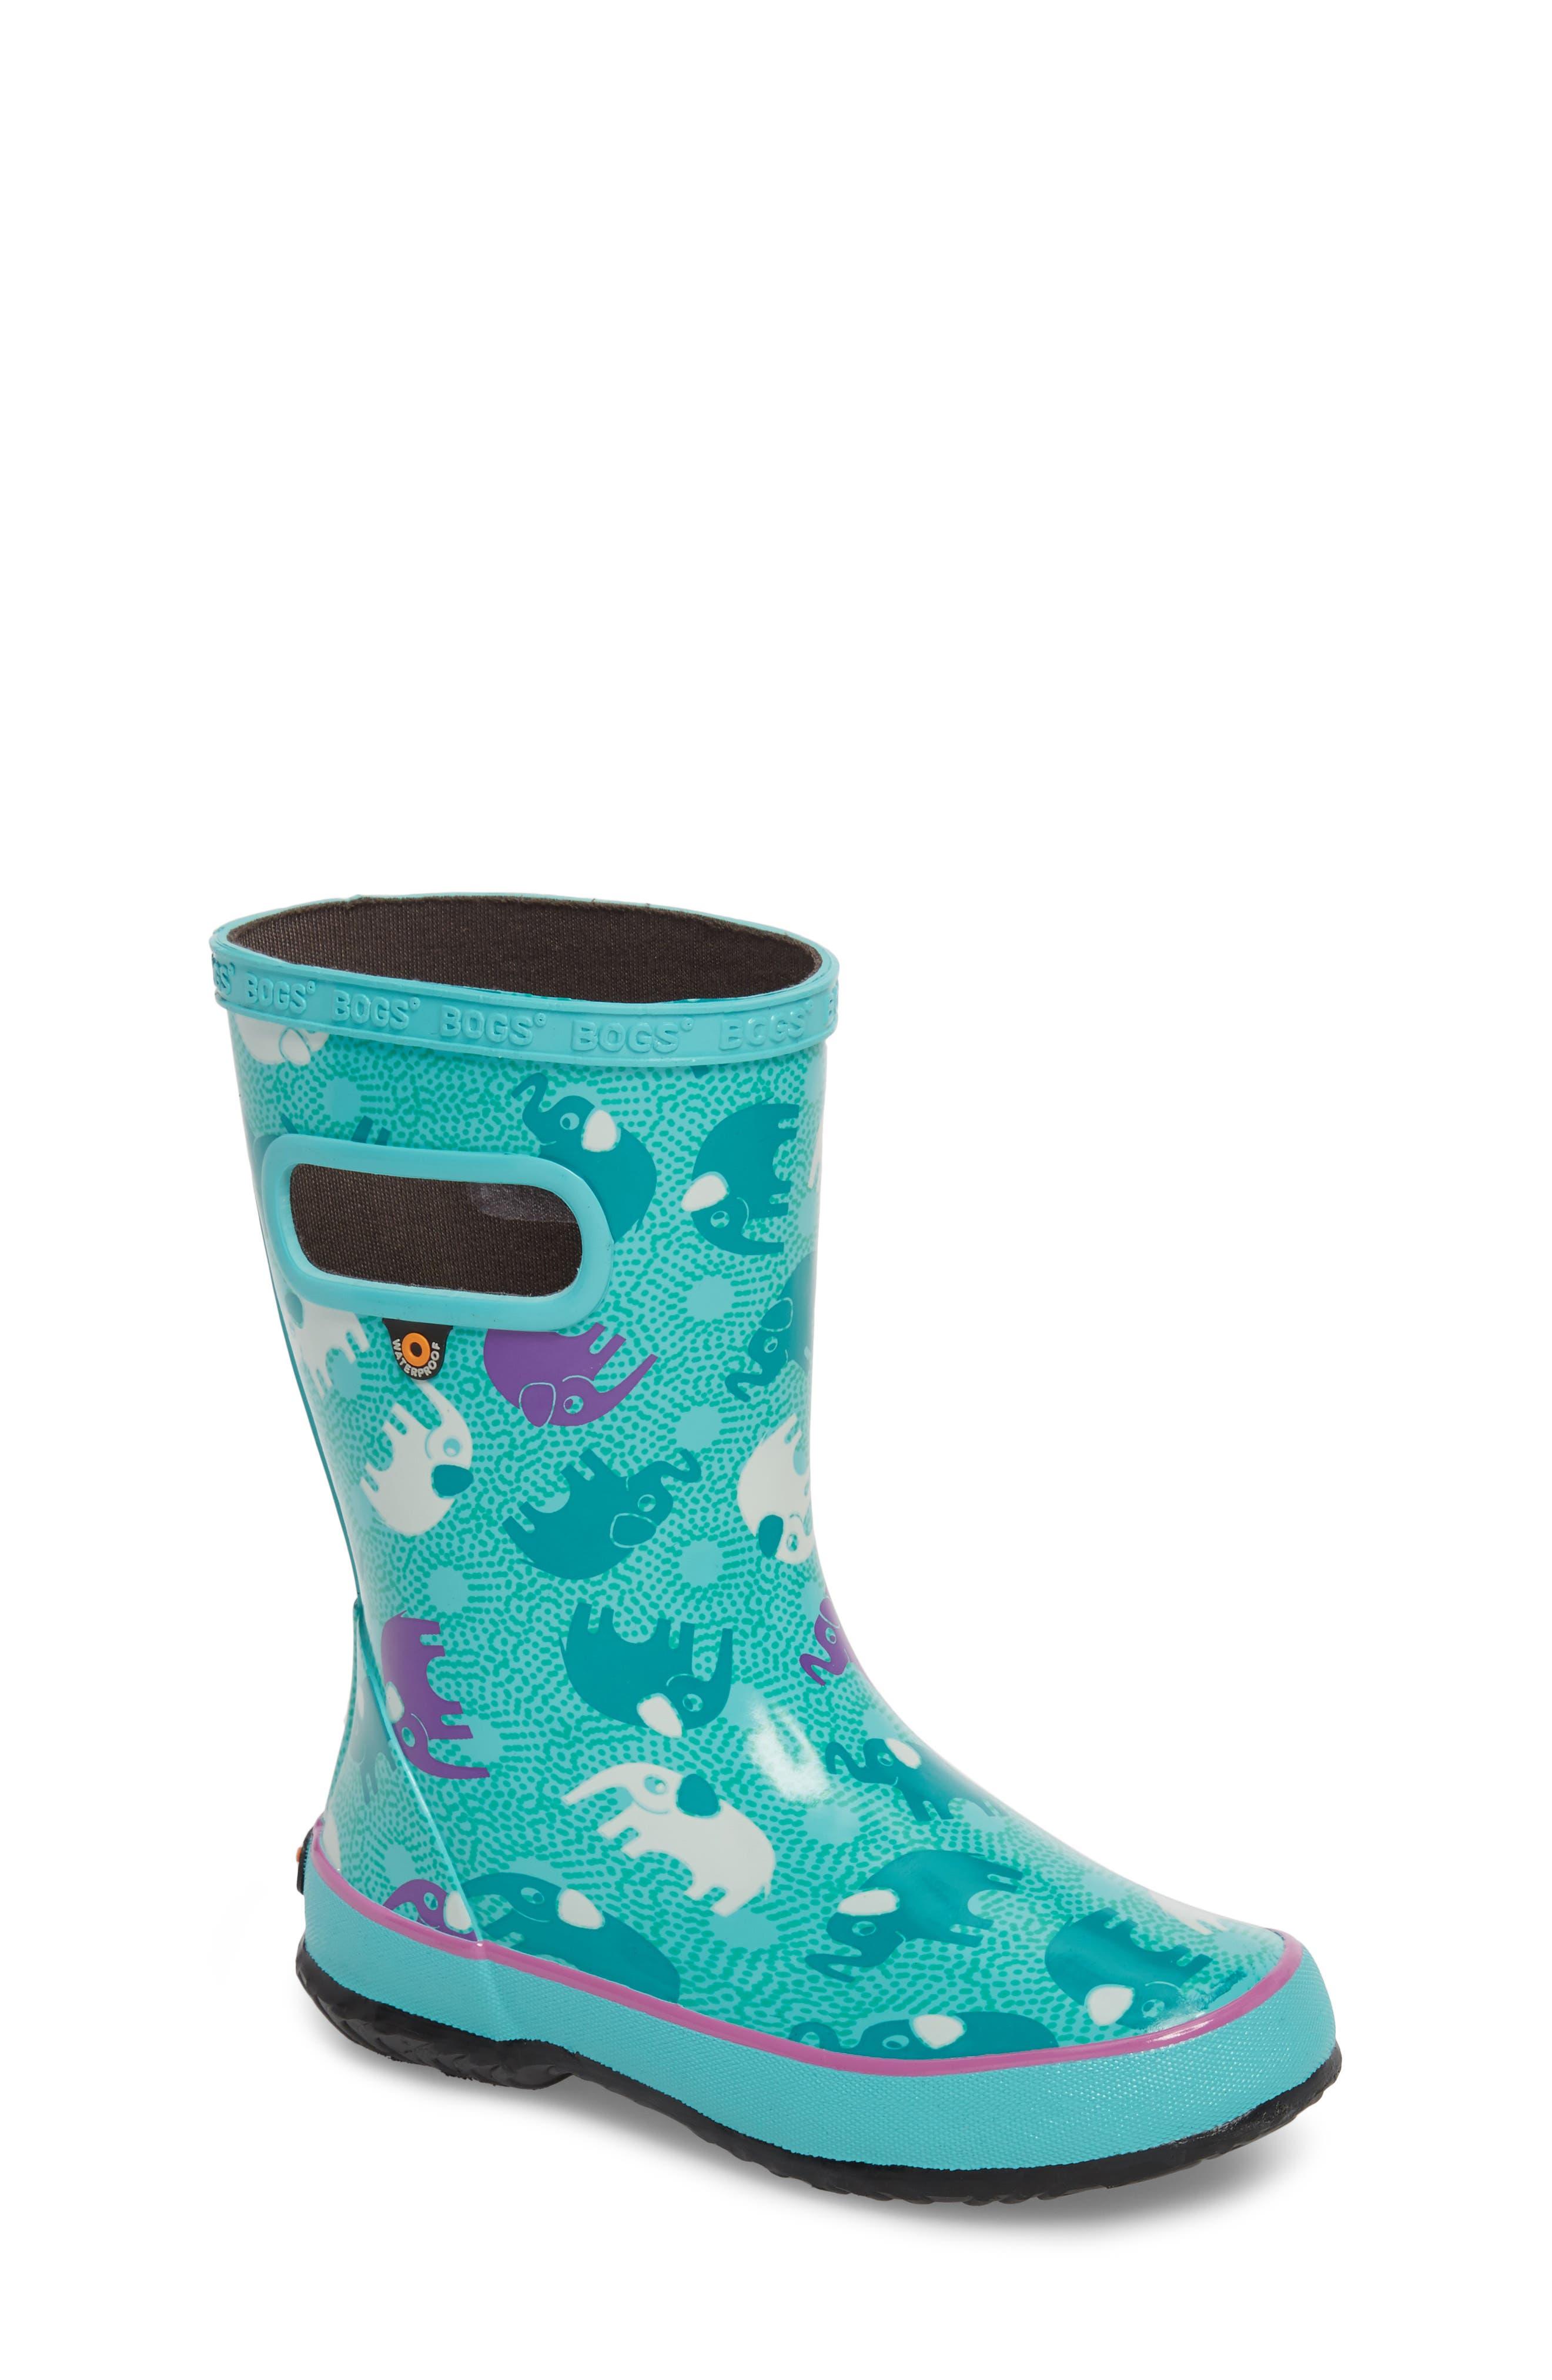 BOGS, Skipper Elephant Print Rubber Waterproof Rain Boot, Main thumbnail 1, color, TURQUOISE MULTI